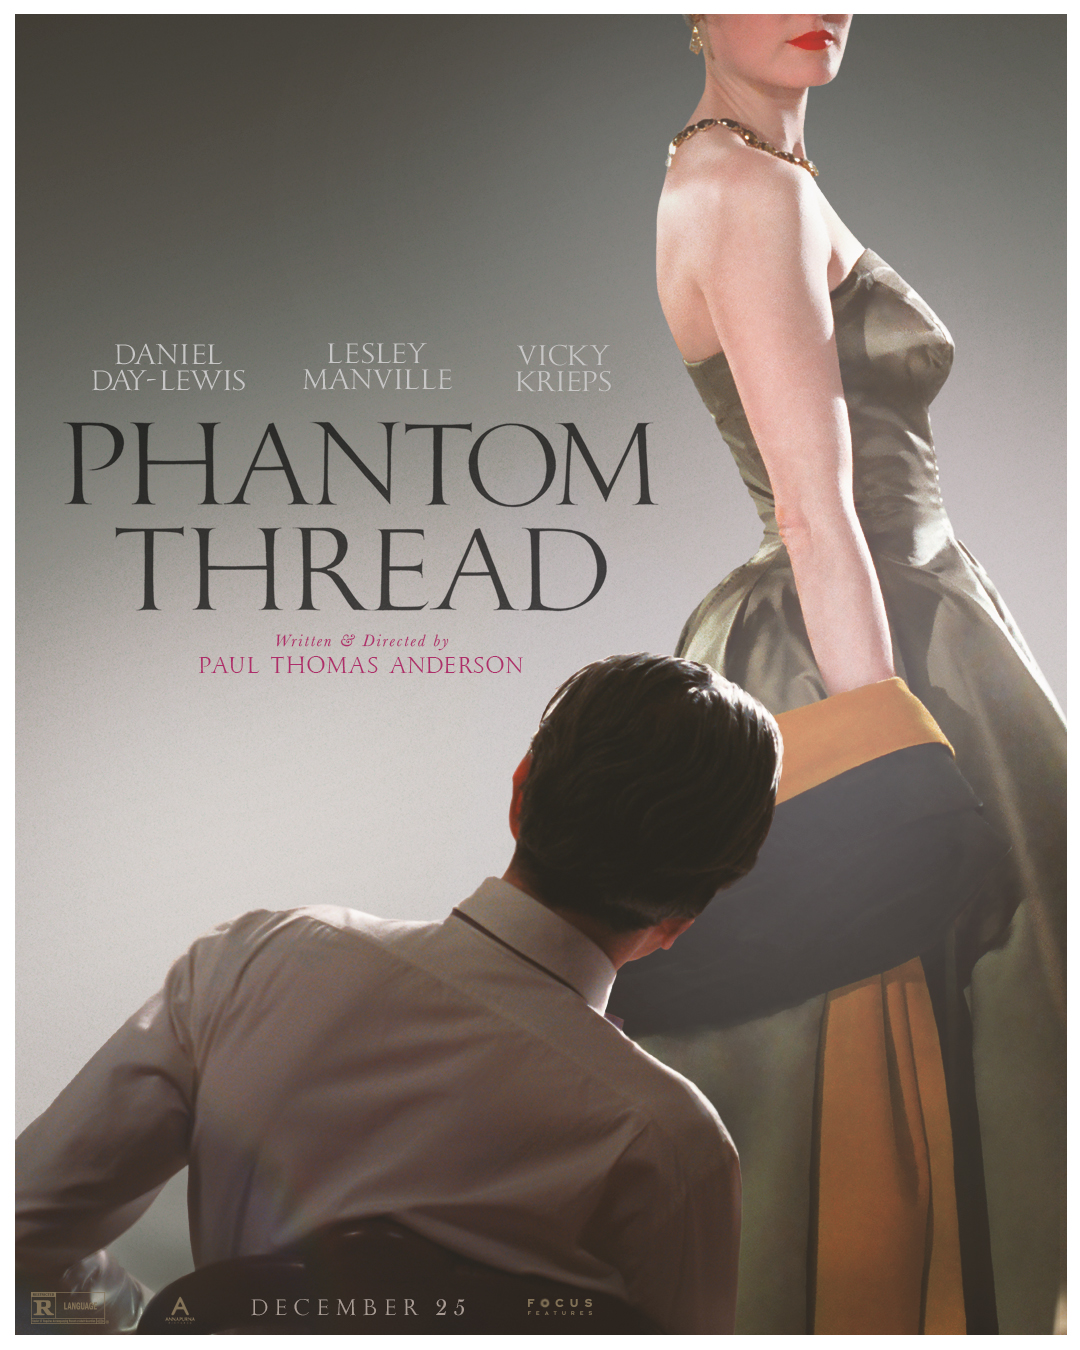 Phantom_Thread_Teaser_INSTGRM.jpg